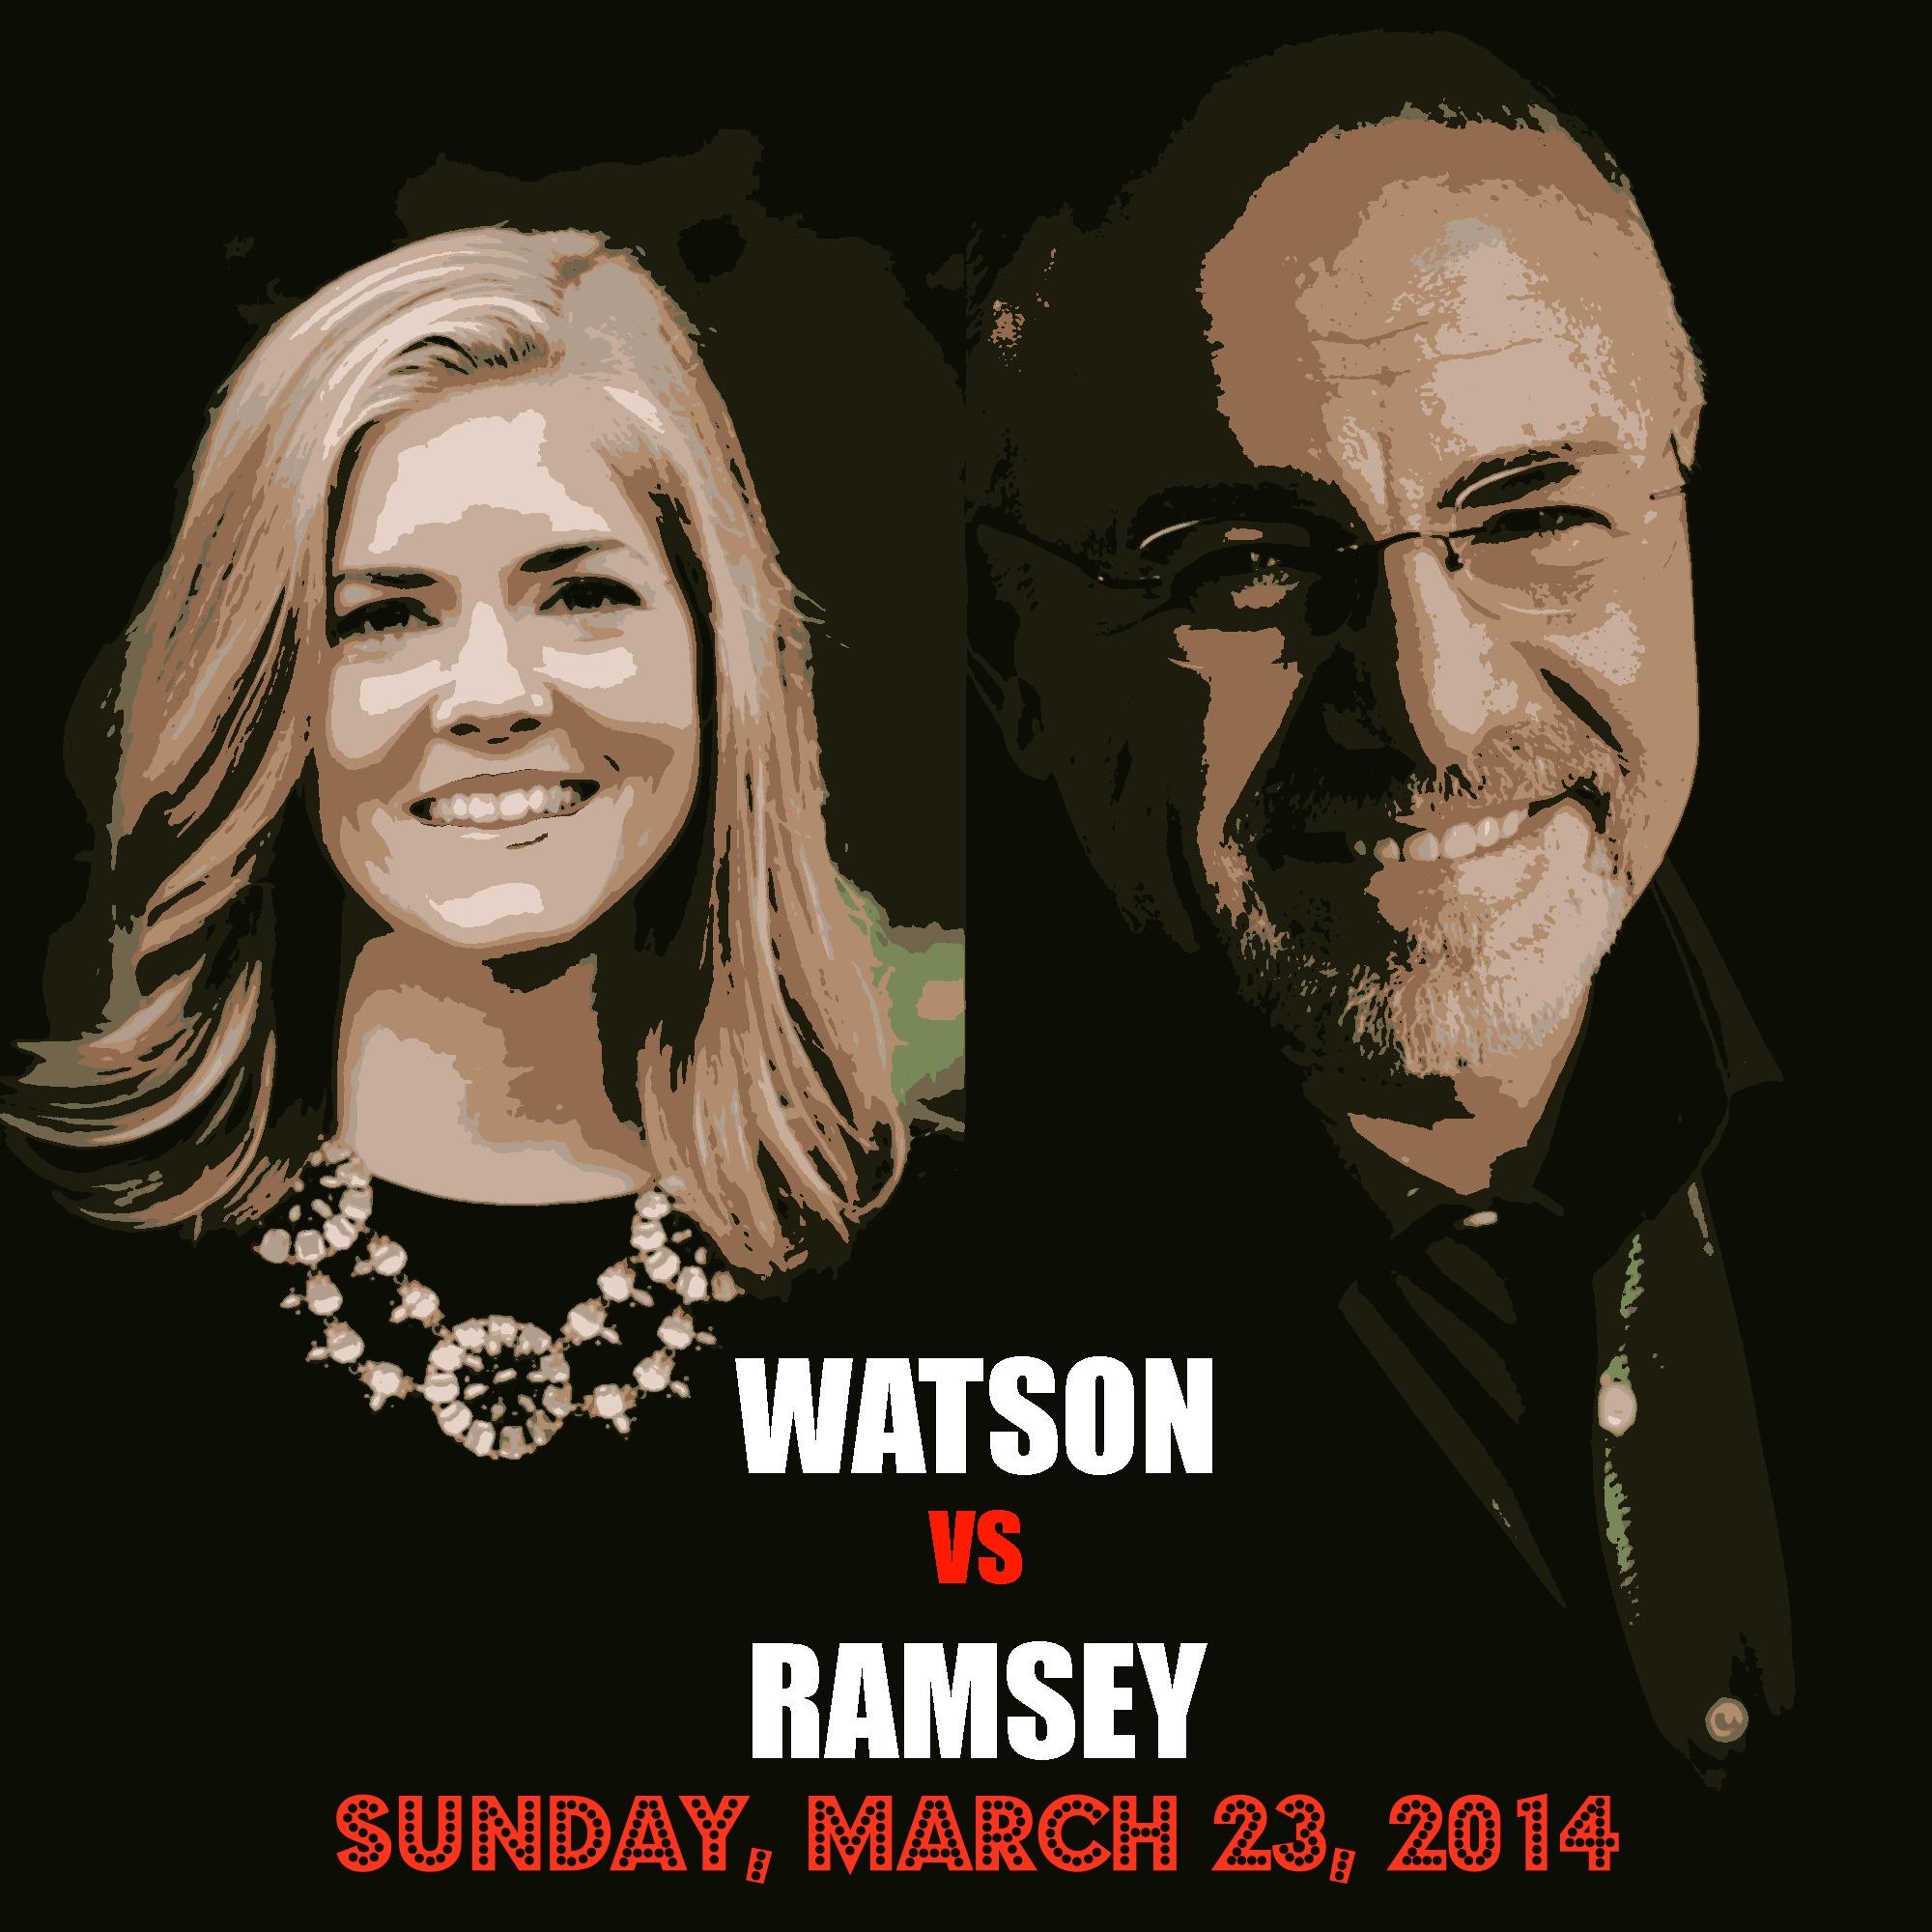 Dave ramsey endorsed car dealer - Dave Ramsey Endorsed Car Dealer 34